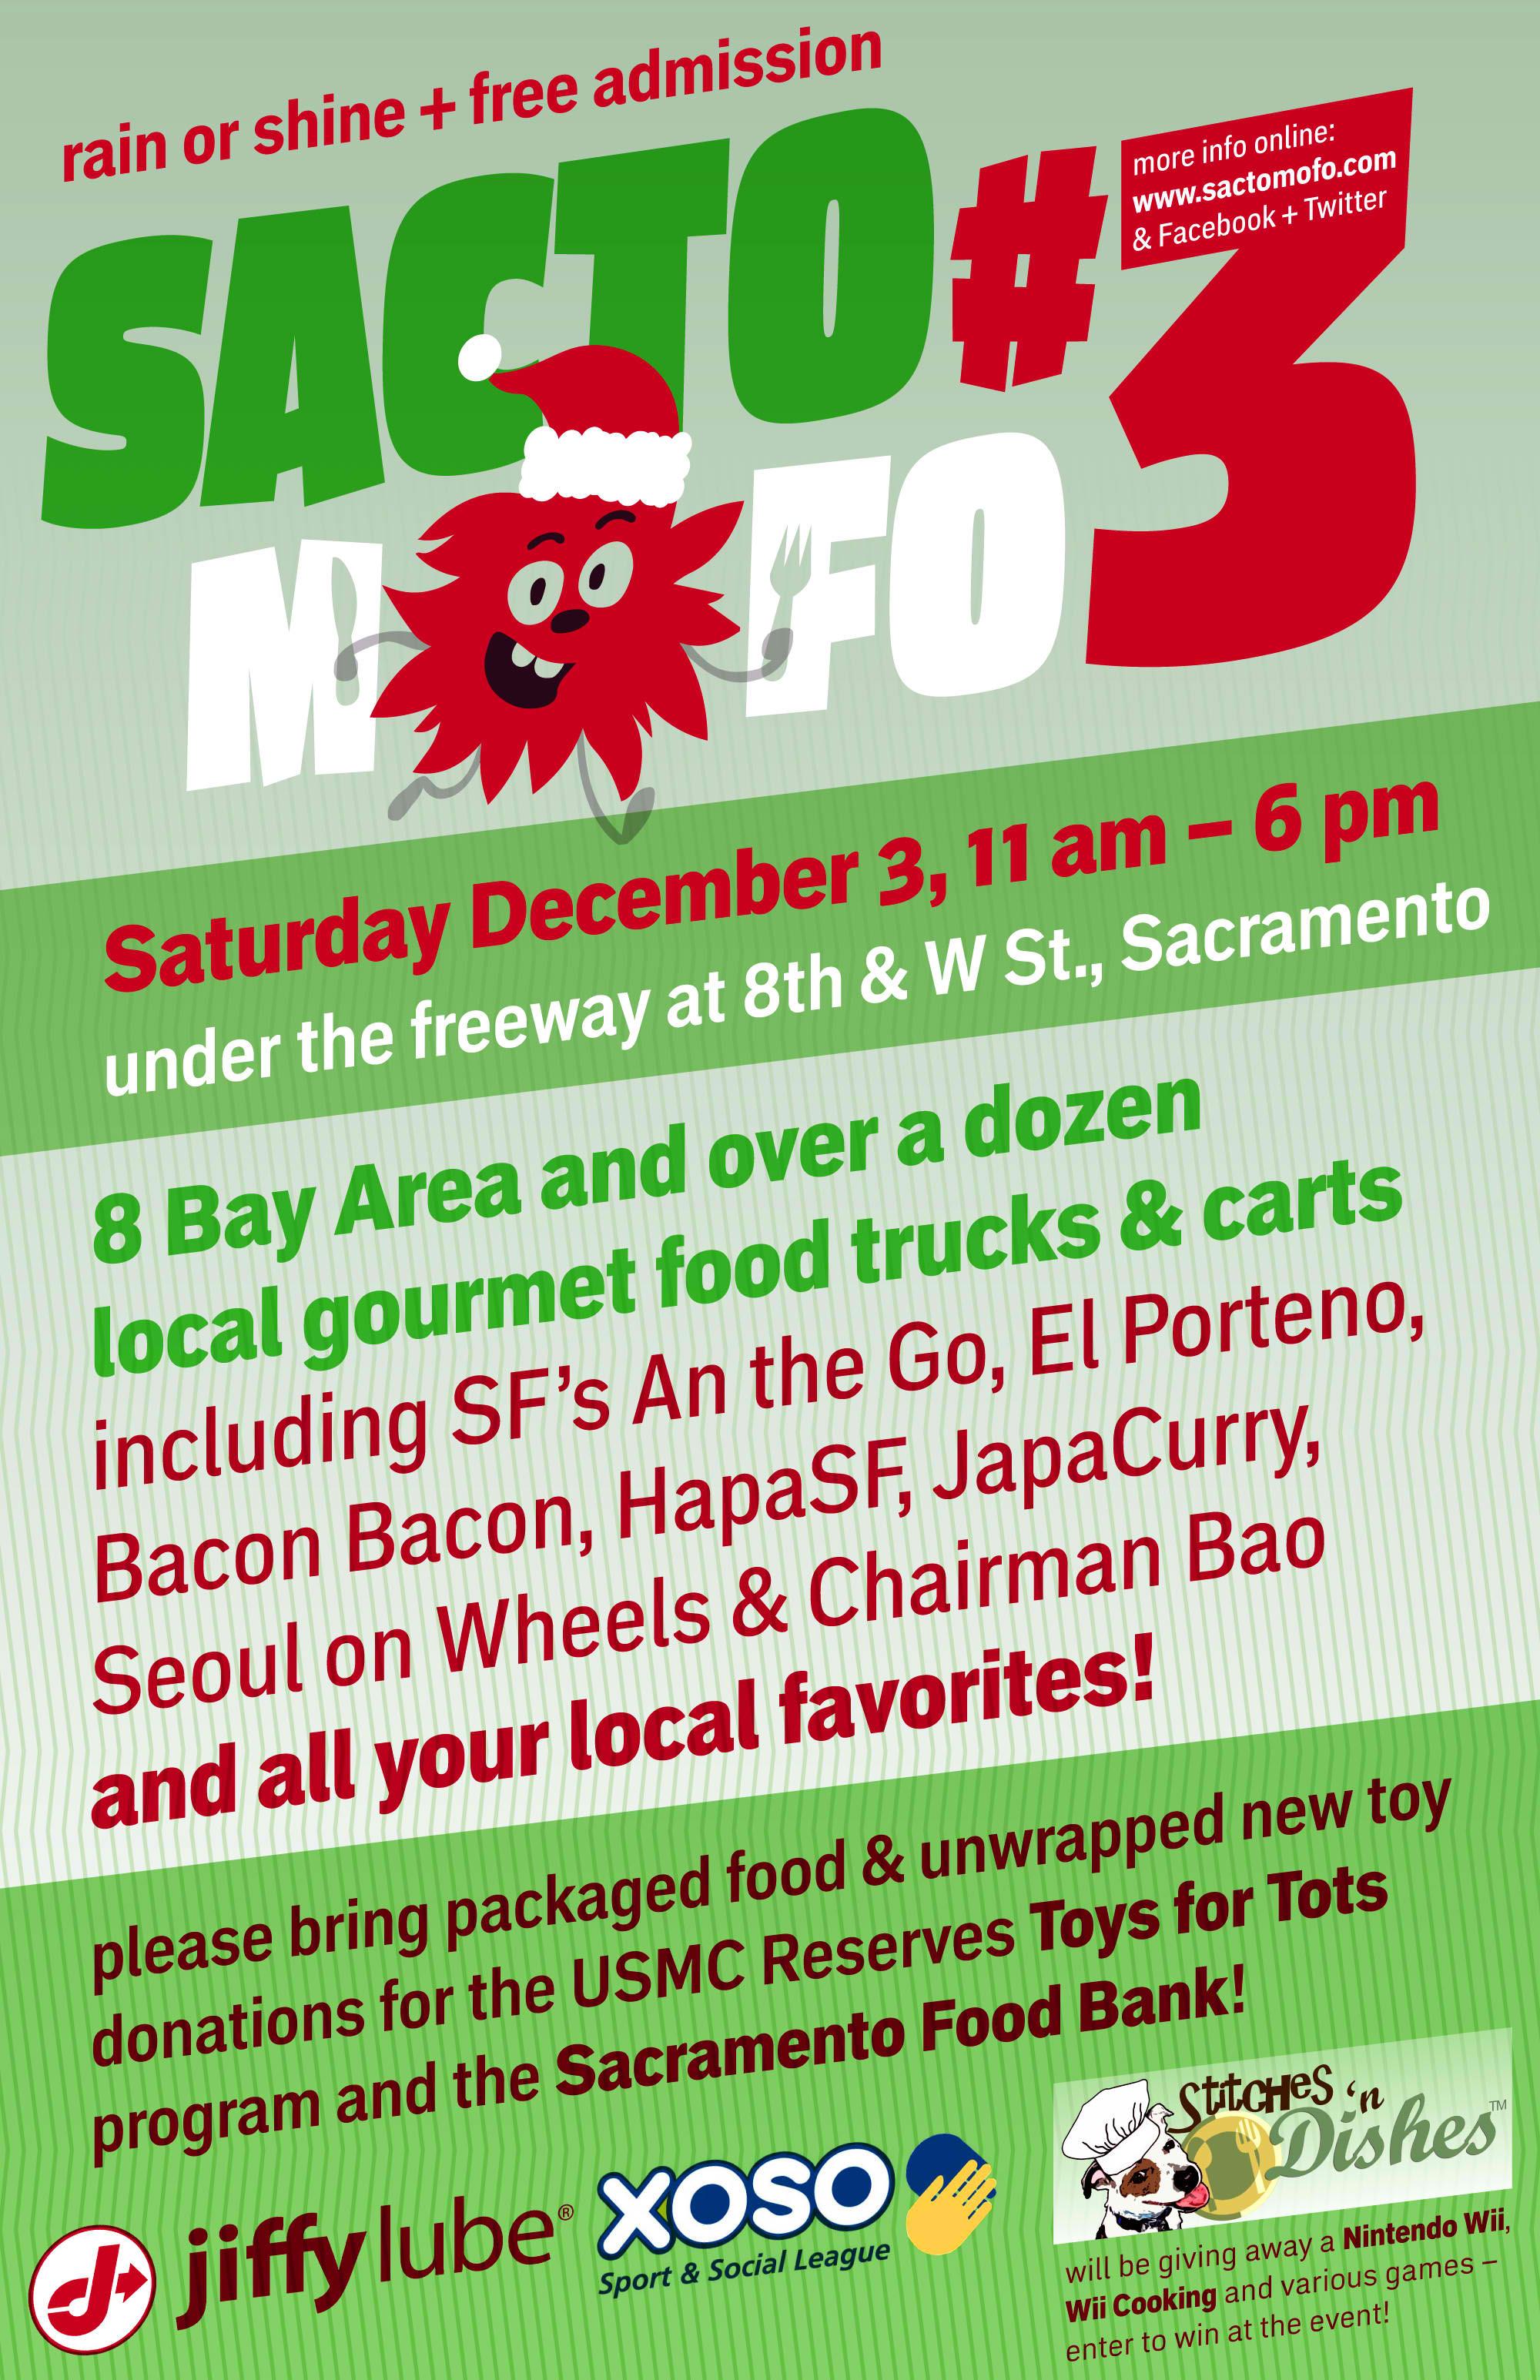 SactoMoFo3 -- 8th & W Sacramento Dec.3rd, 2012